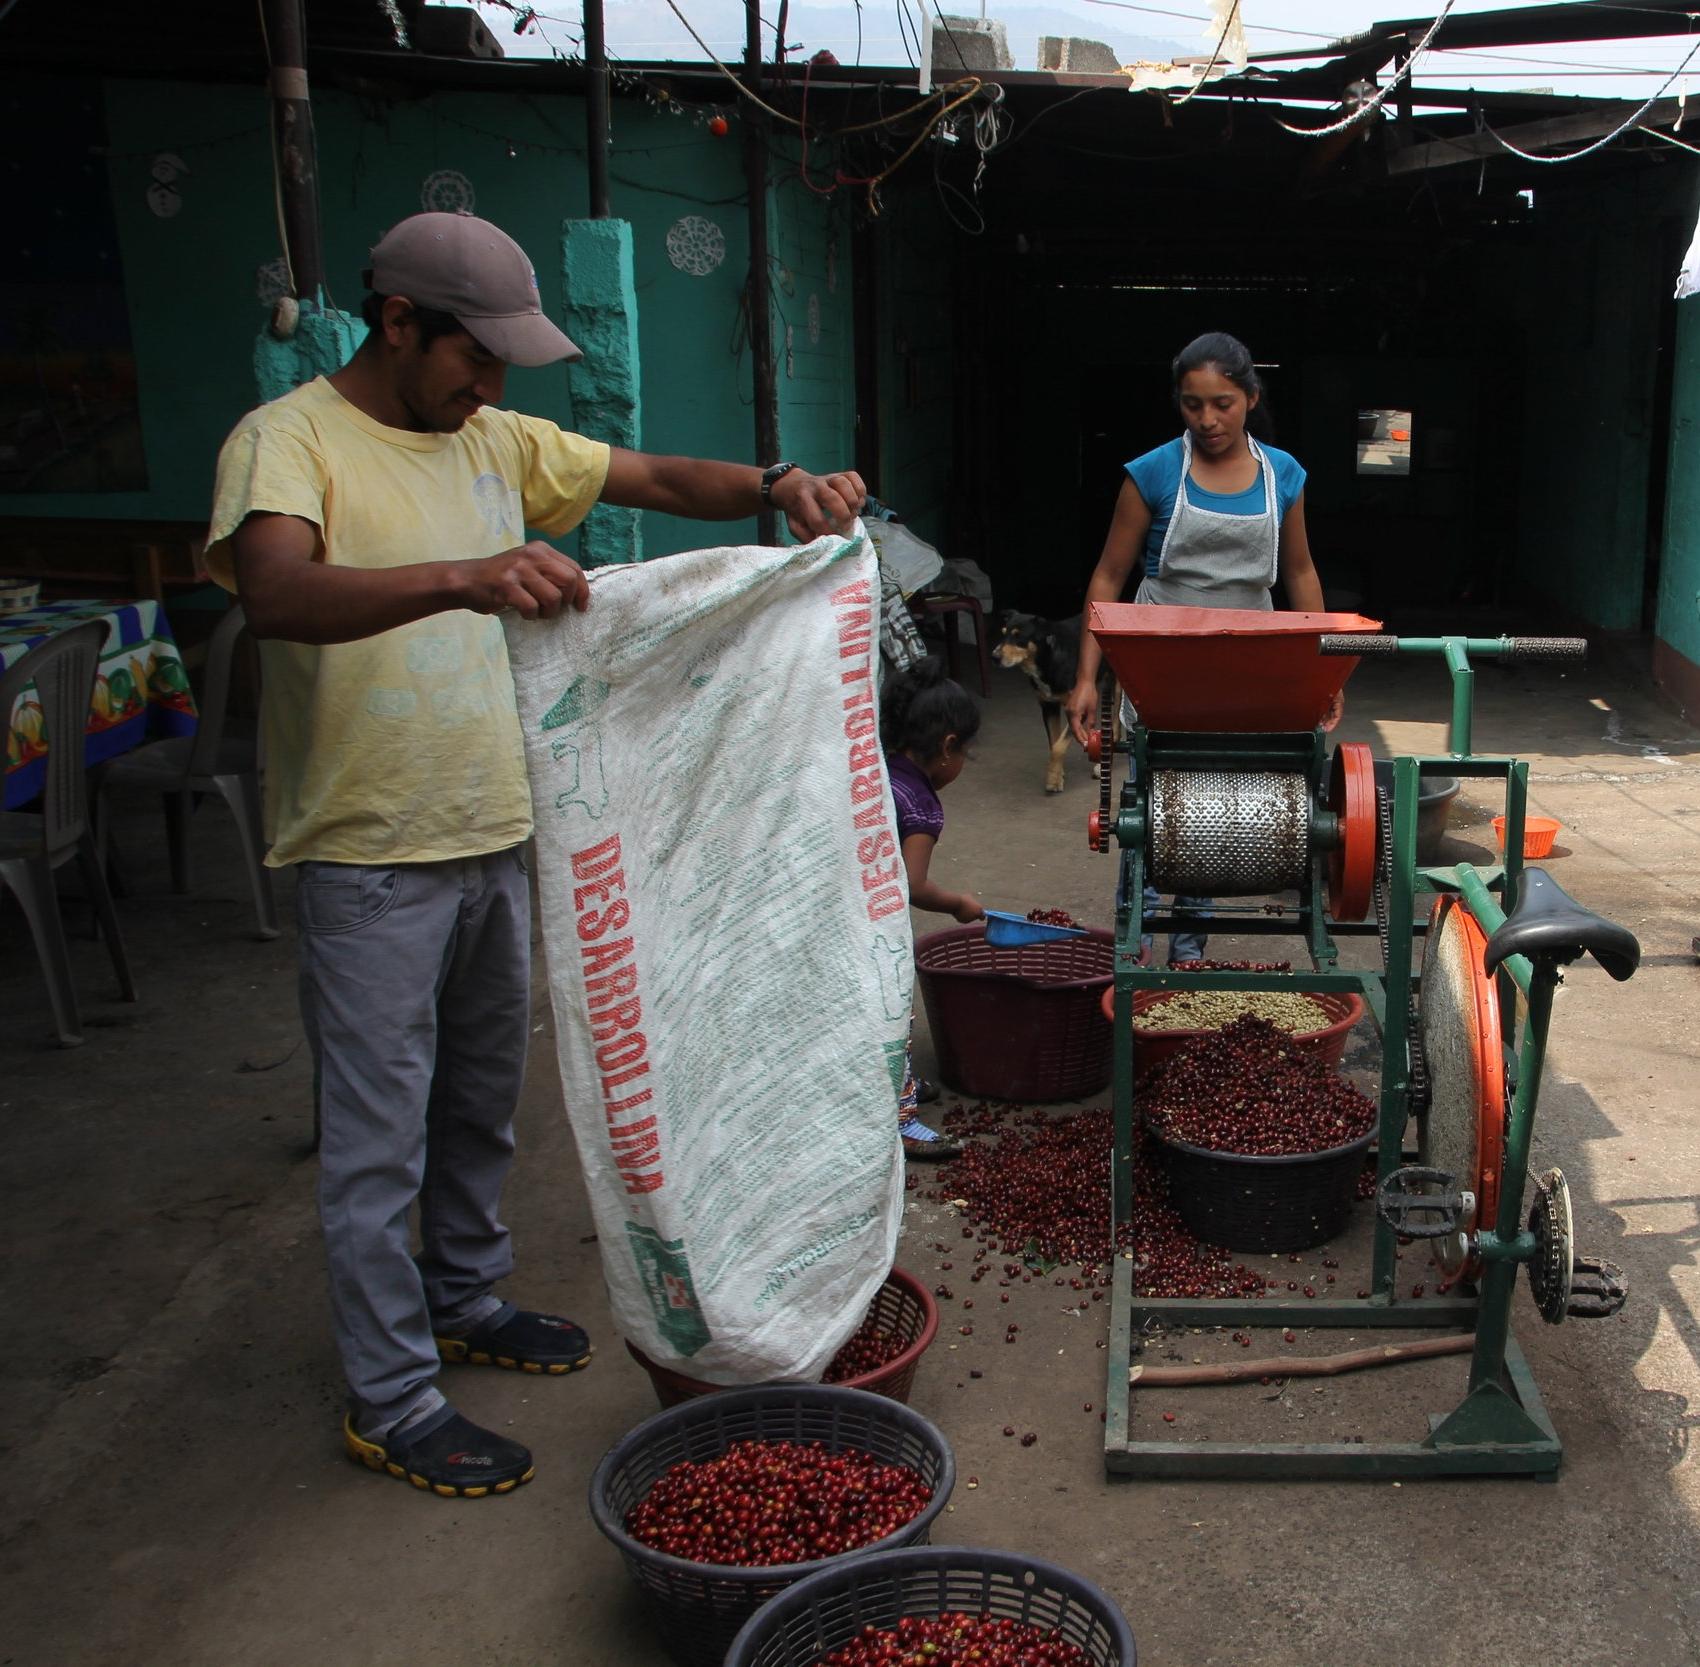 Mario & Valeriana depulping coffee